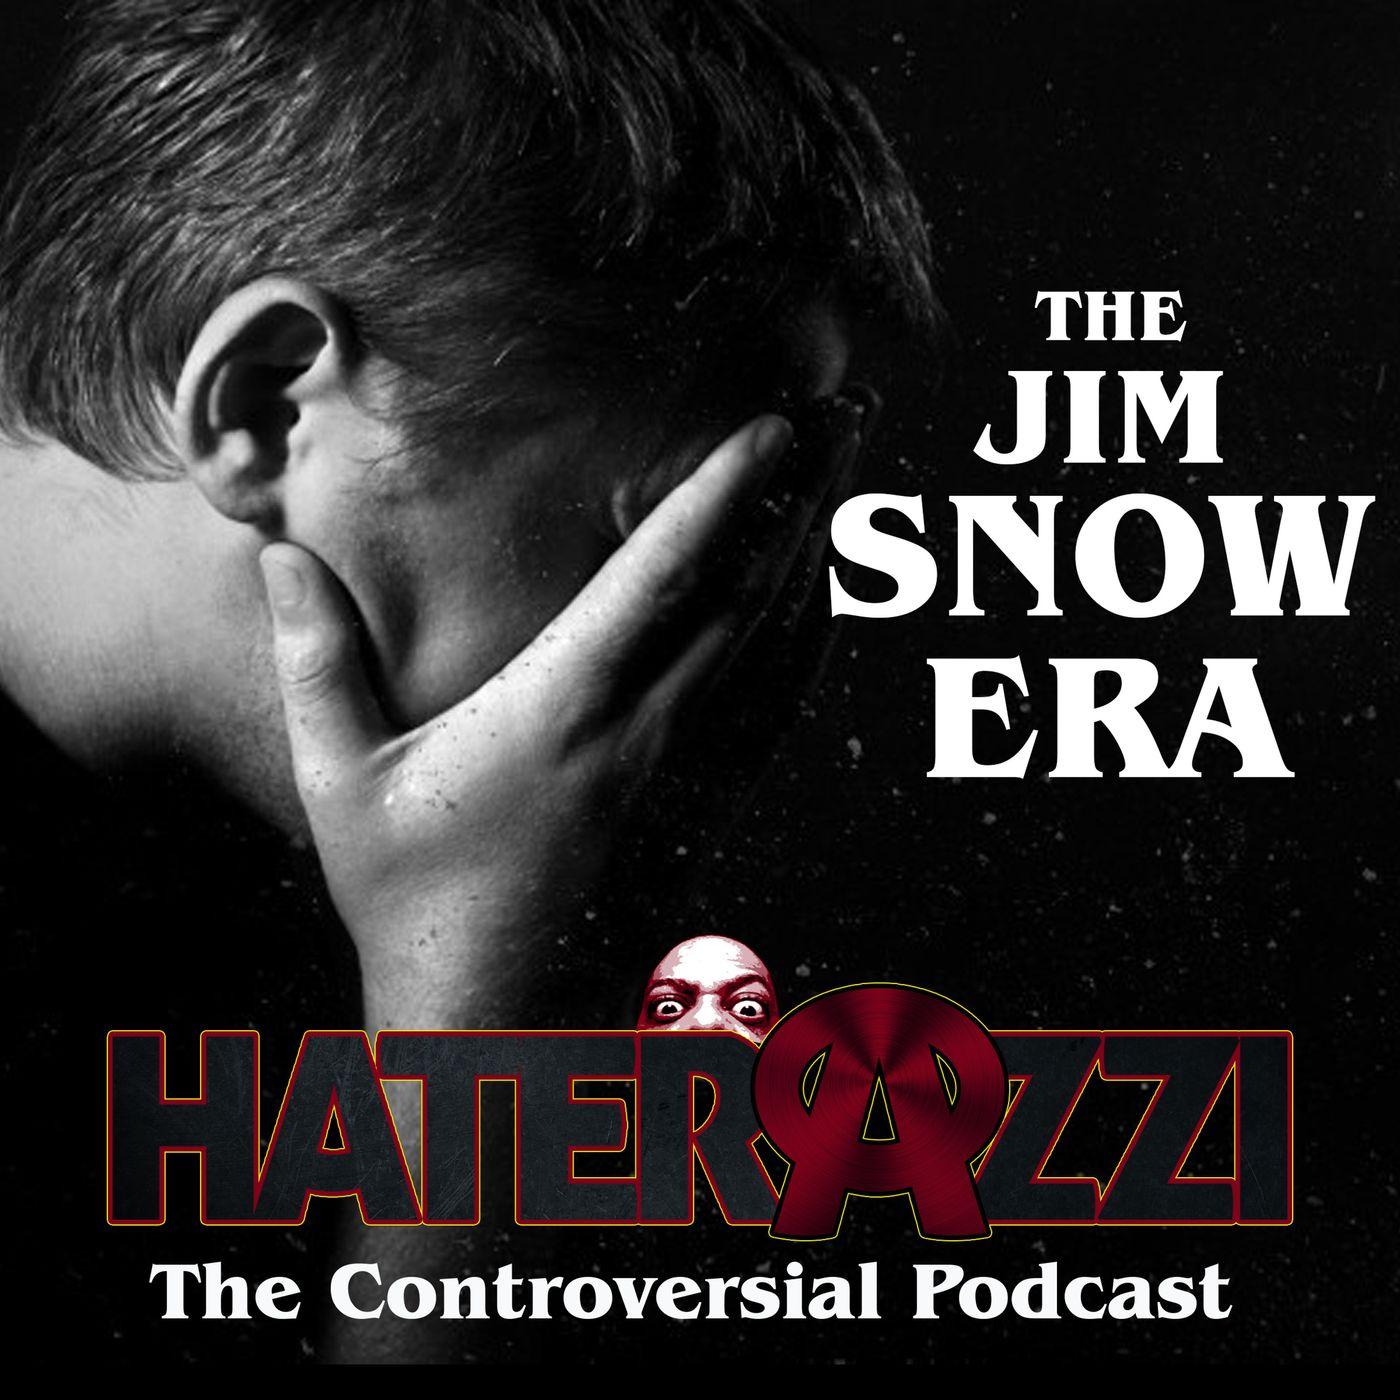 The Jim Snow Era